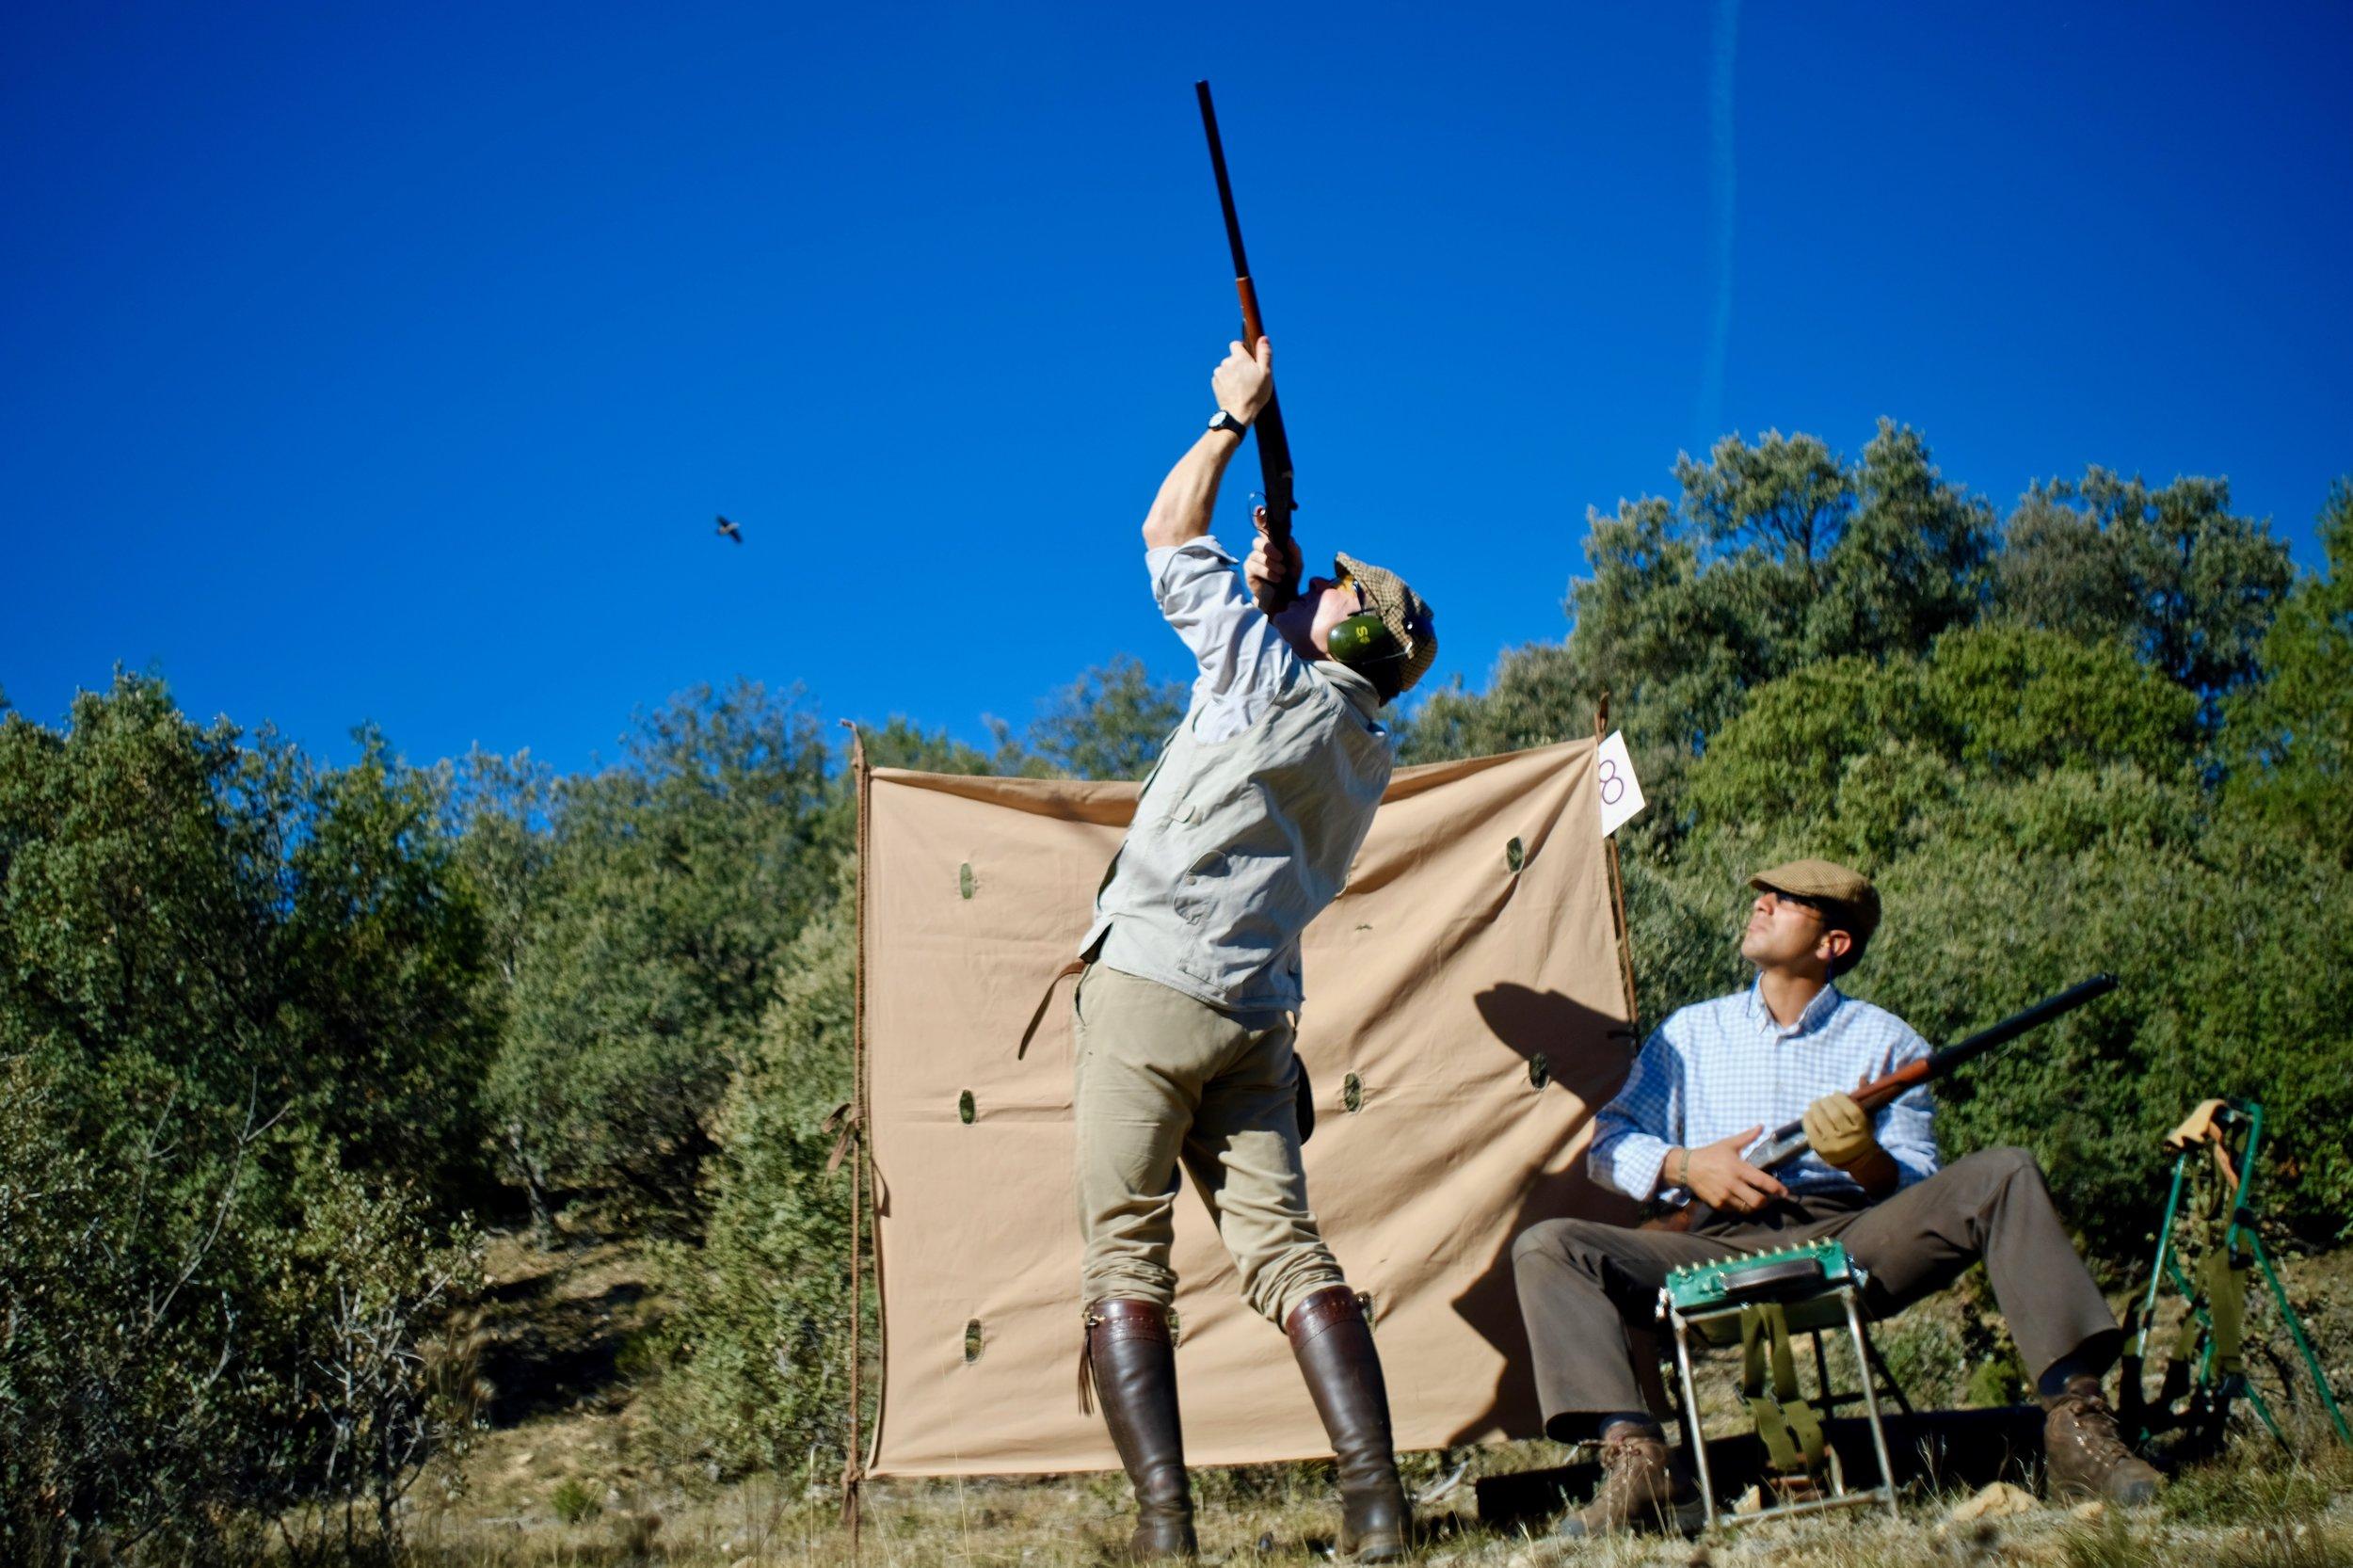 quintanar-partridge-shooting-spain